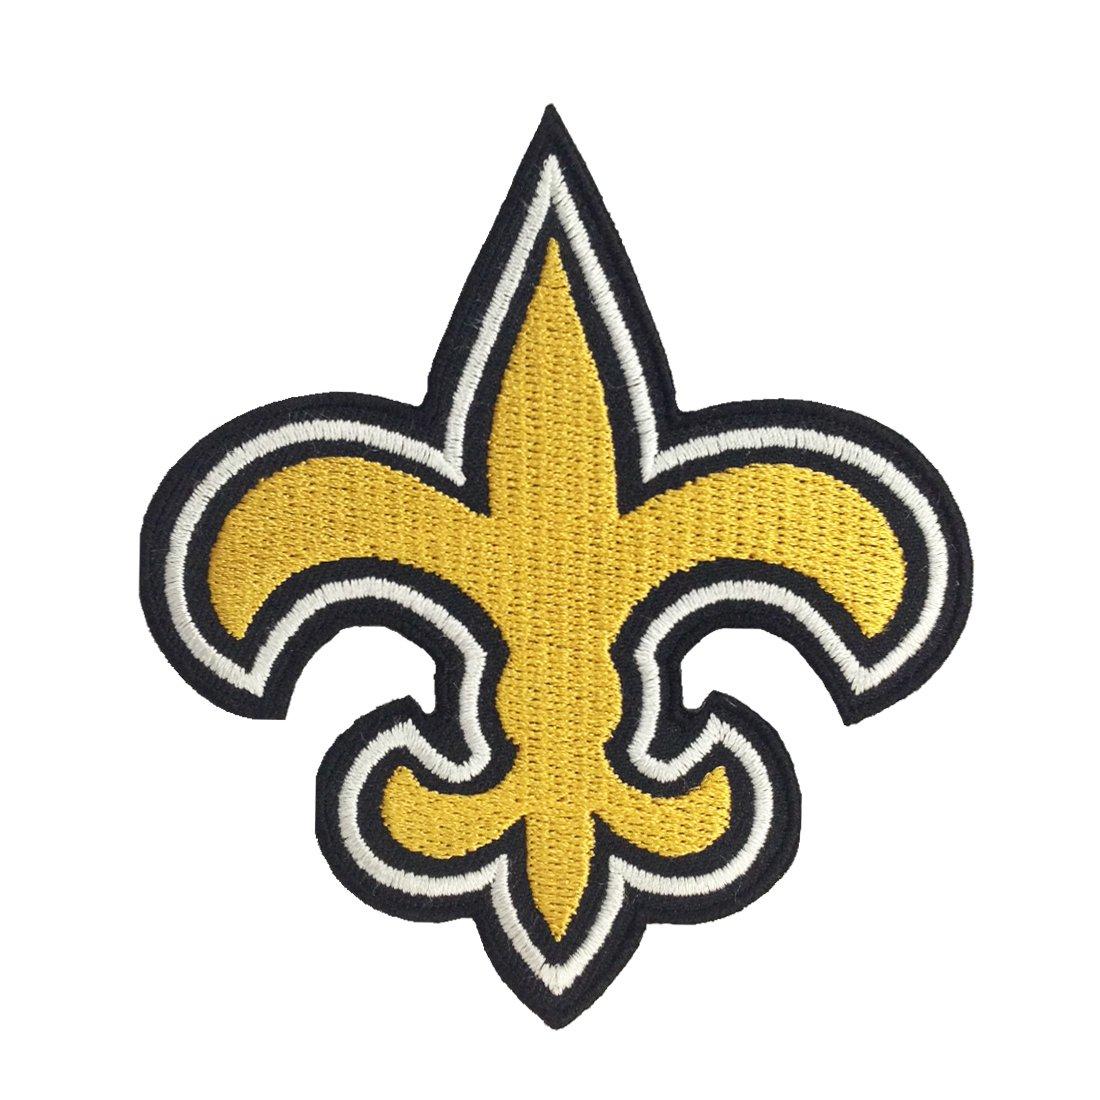 Amazon 1 x new orleans saints logo i embroidered iron patches amazon 1 x new orleans saints logo i embroidered iron patches sports outdoors buycottarizona Choice Image